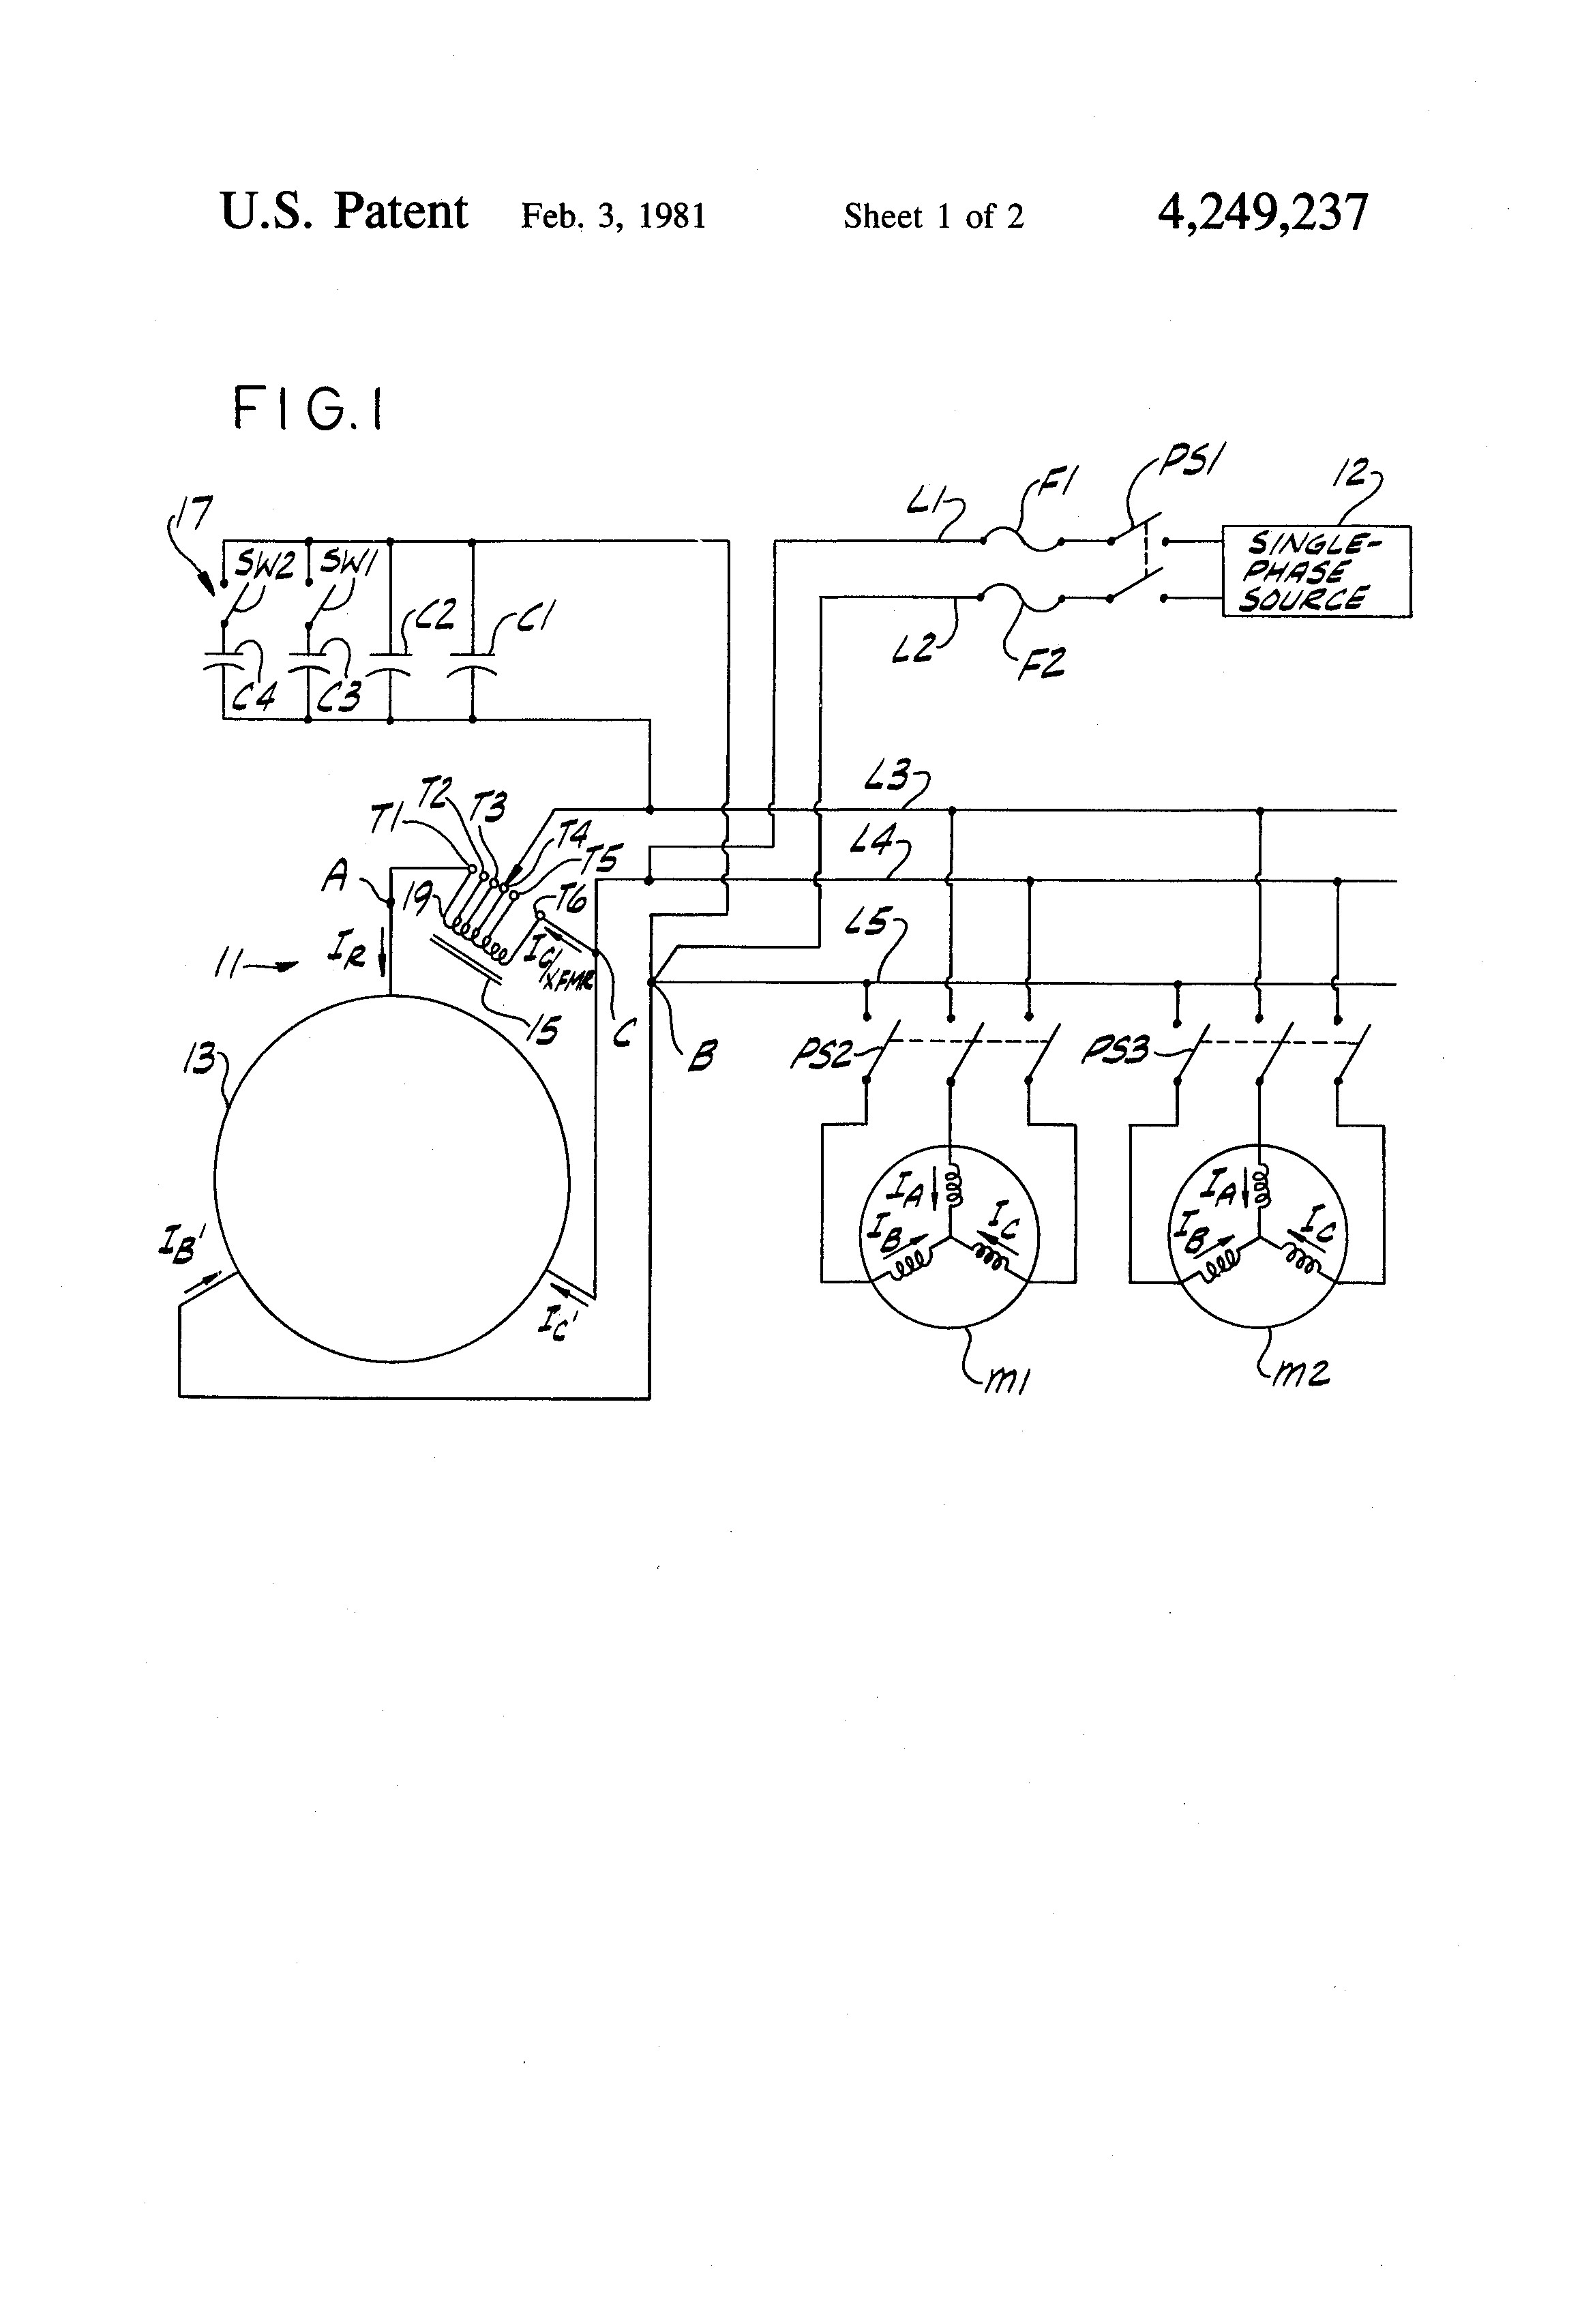 wiring diagram 1997 mako 243 illustration of wiring diagram u2022 rh prowiringdiagram today make wiring diagram Pre-Alpha Mercruiser Wiring-Diagram